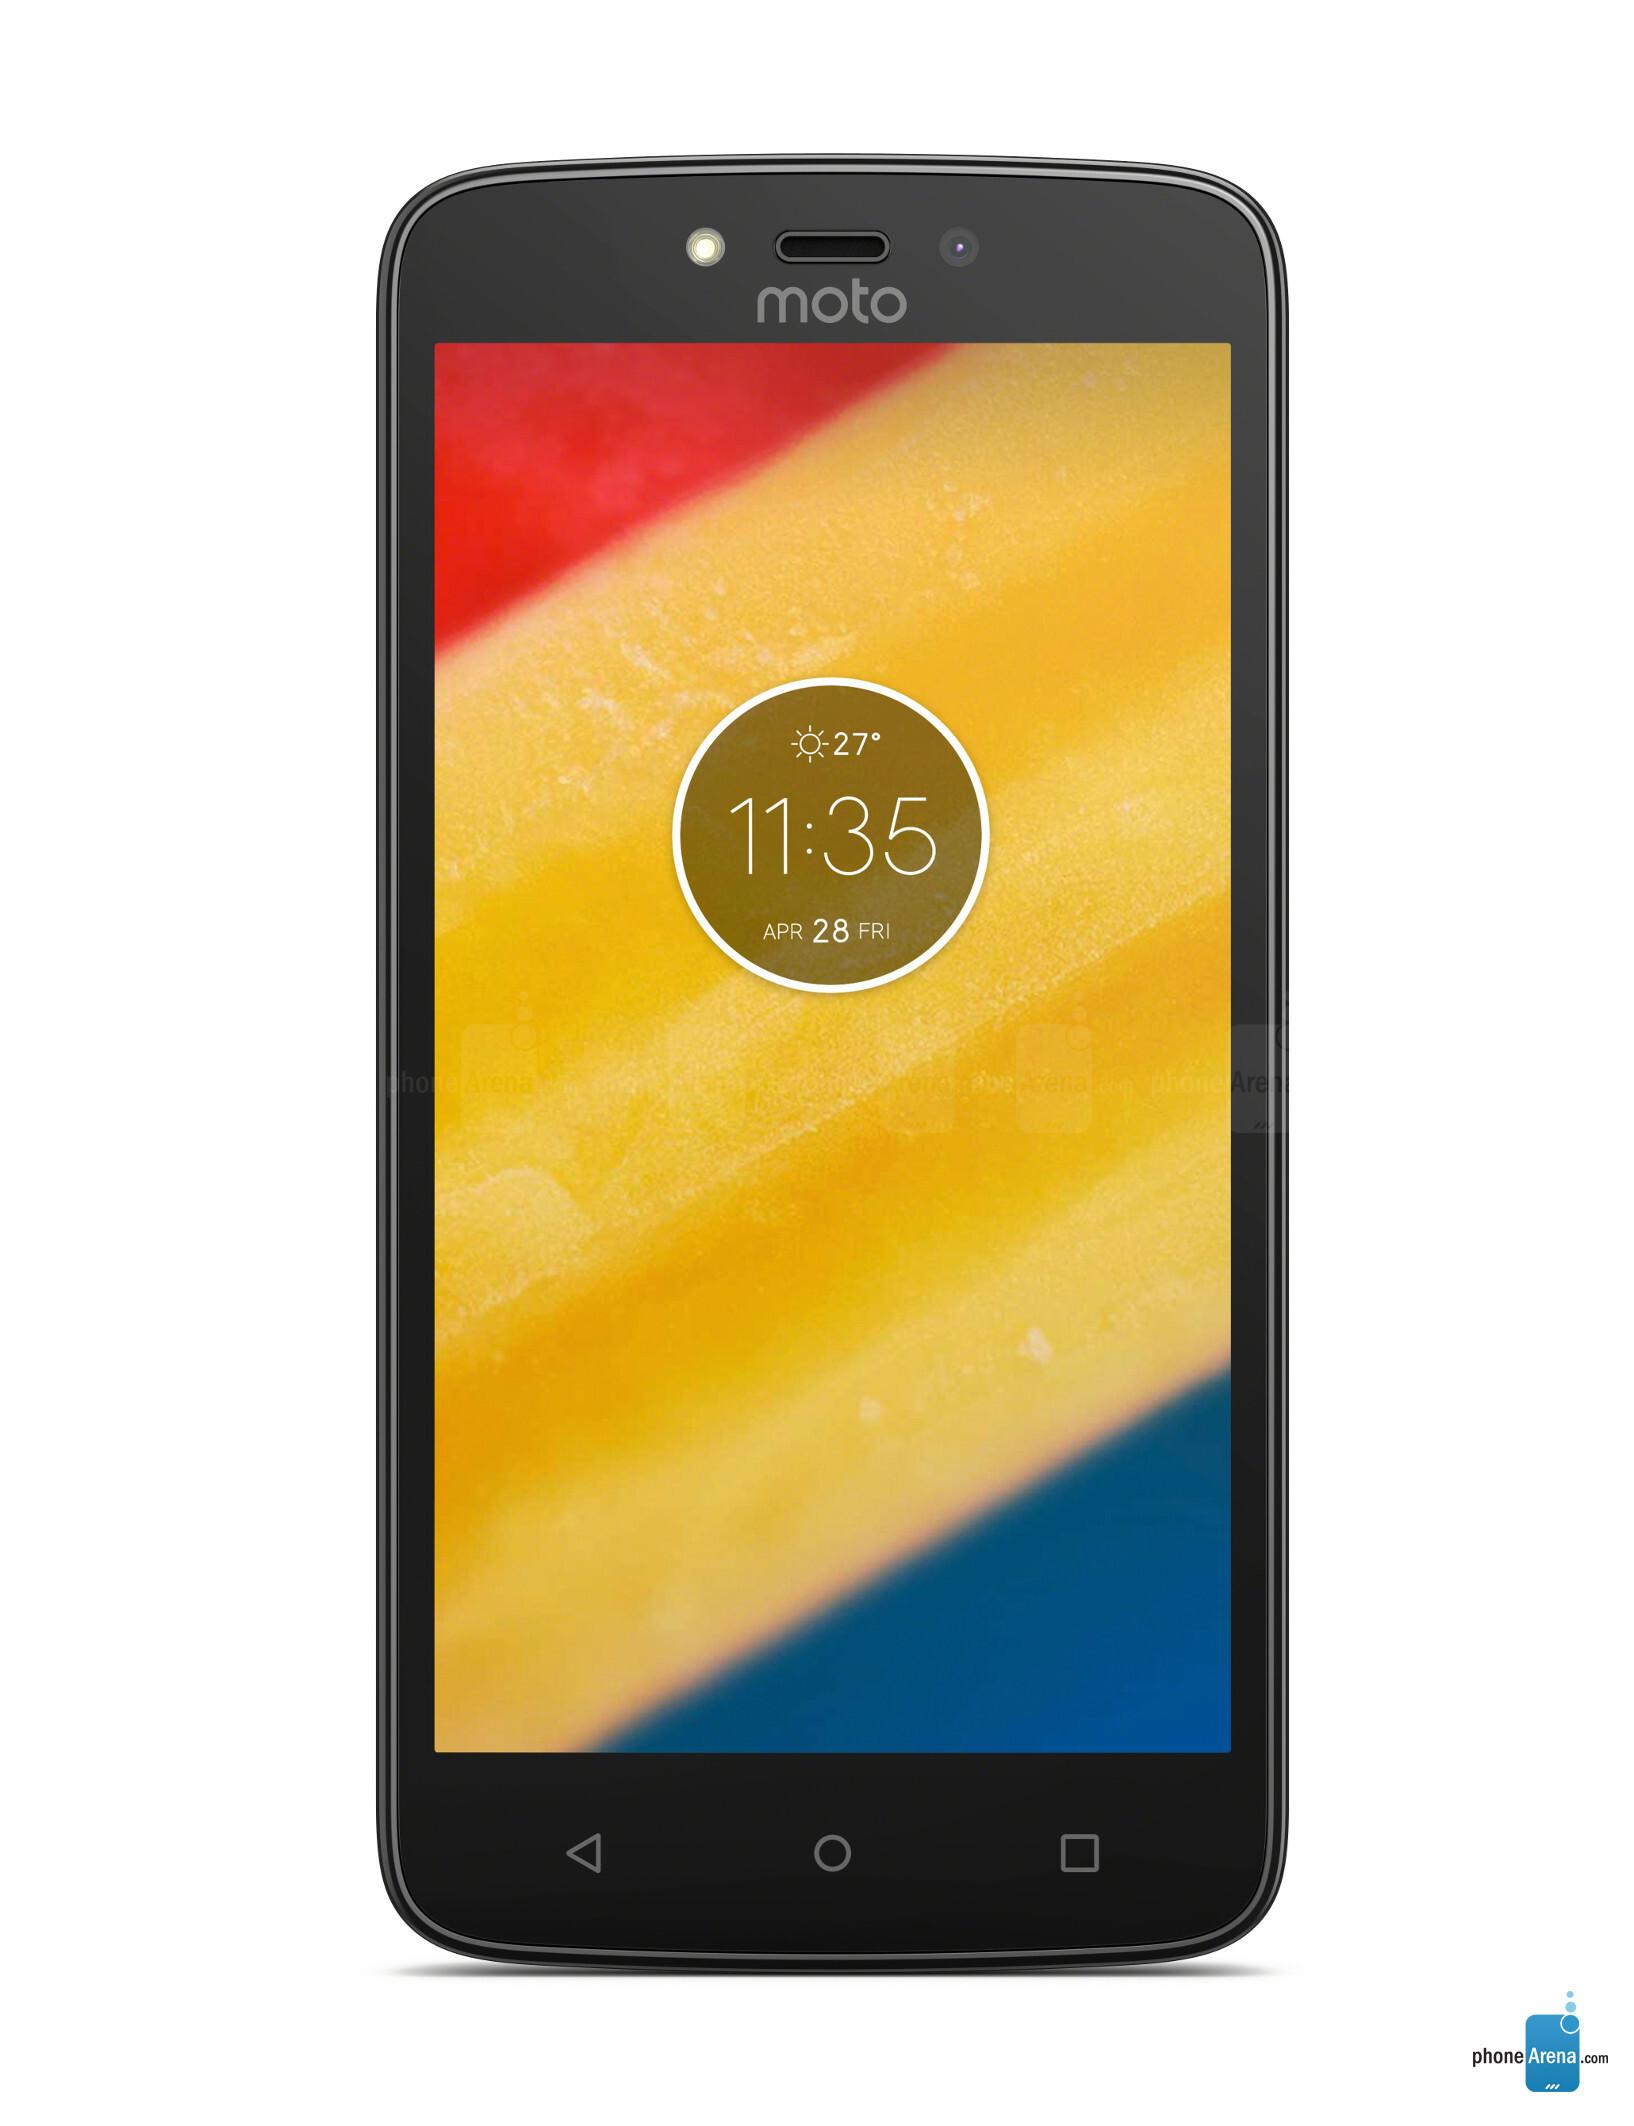 Motorola Moto C Plus specifications